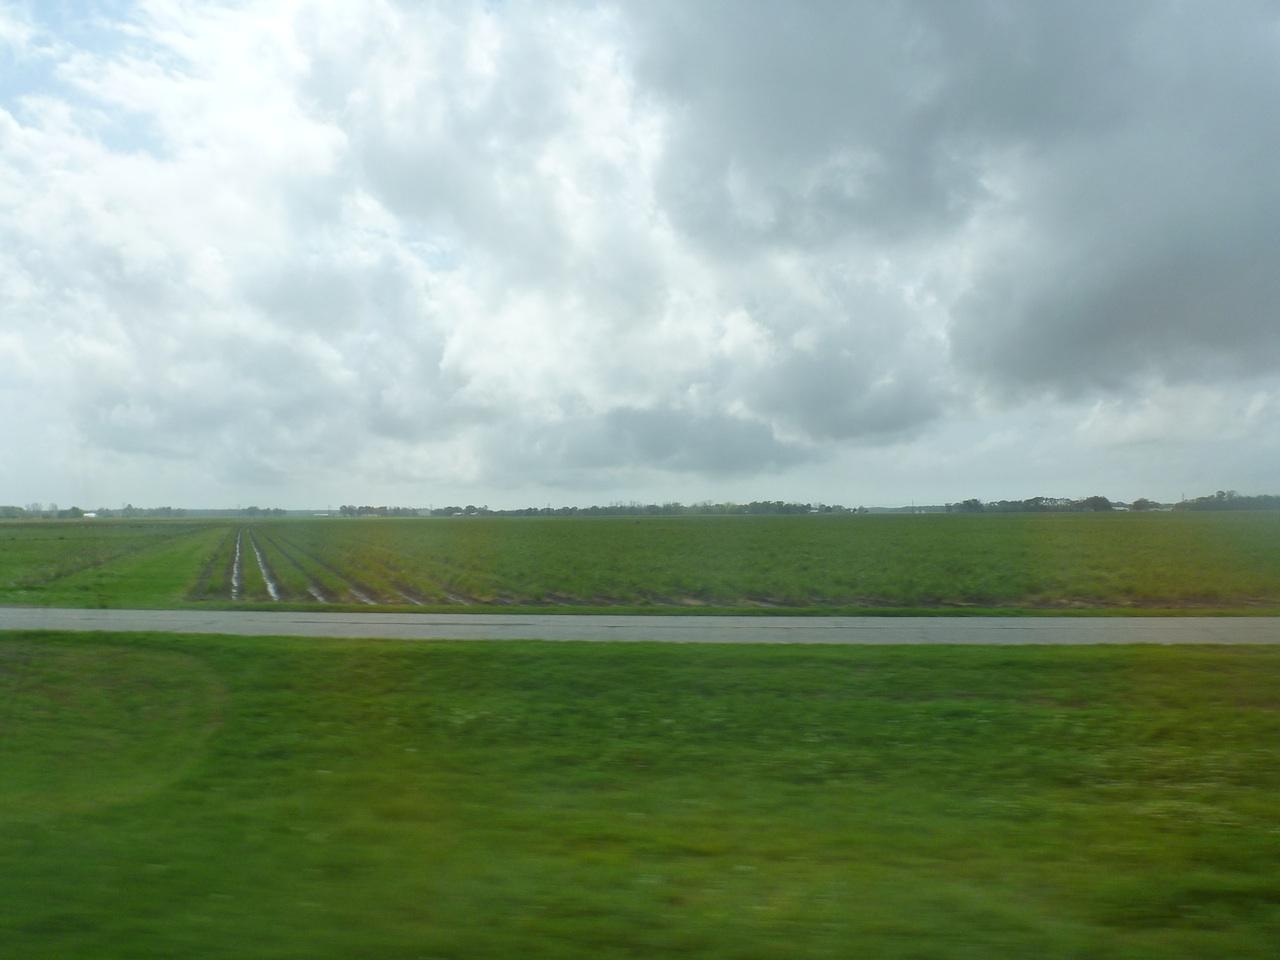 Some Farmland Around The Area